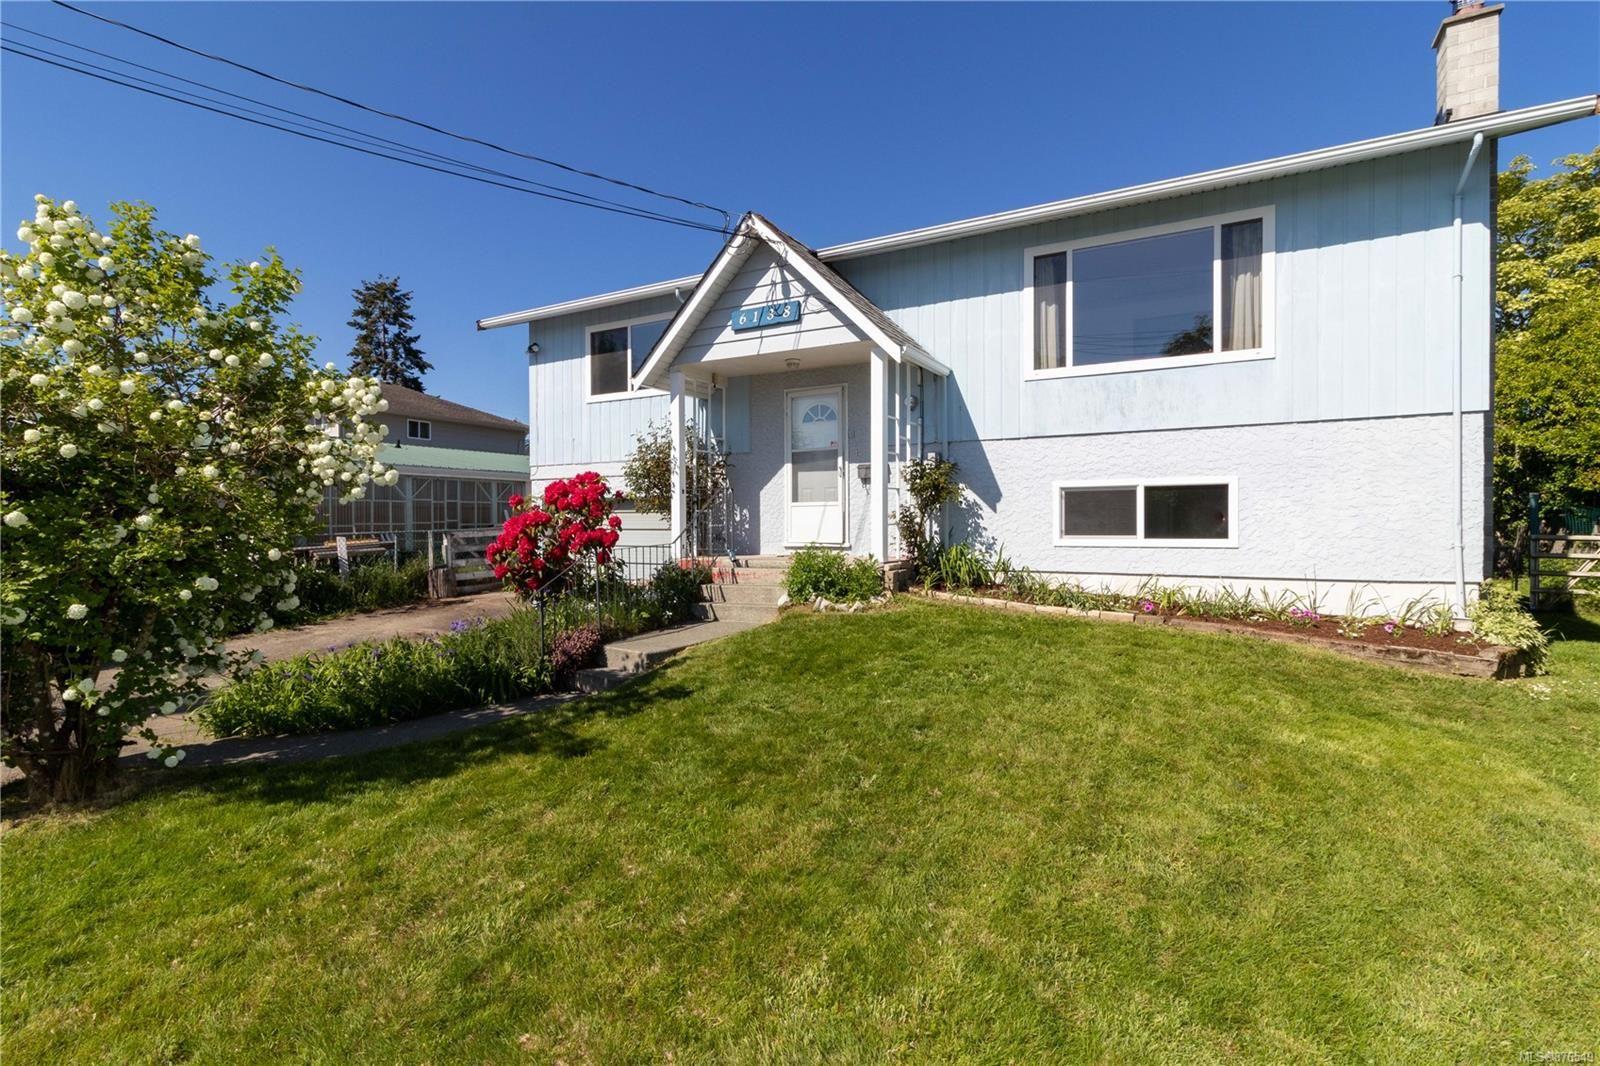 Main Photo: 6138 Marsh Rd in : Du West Duncan House for sale (Duncan)  : MLS®# 876549